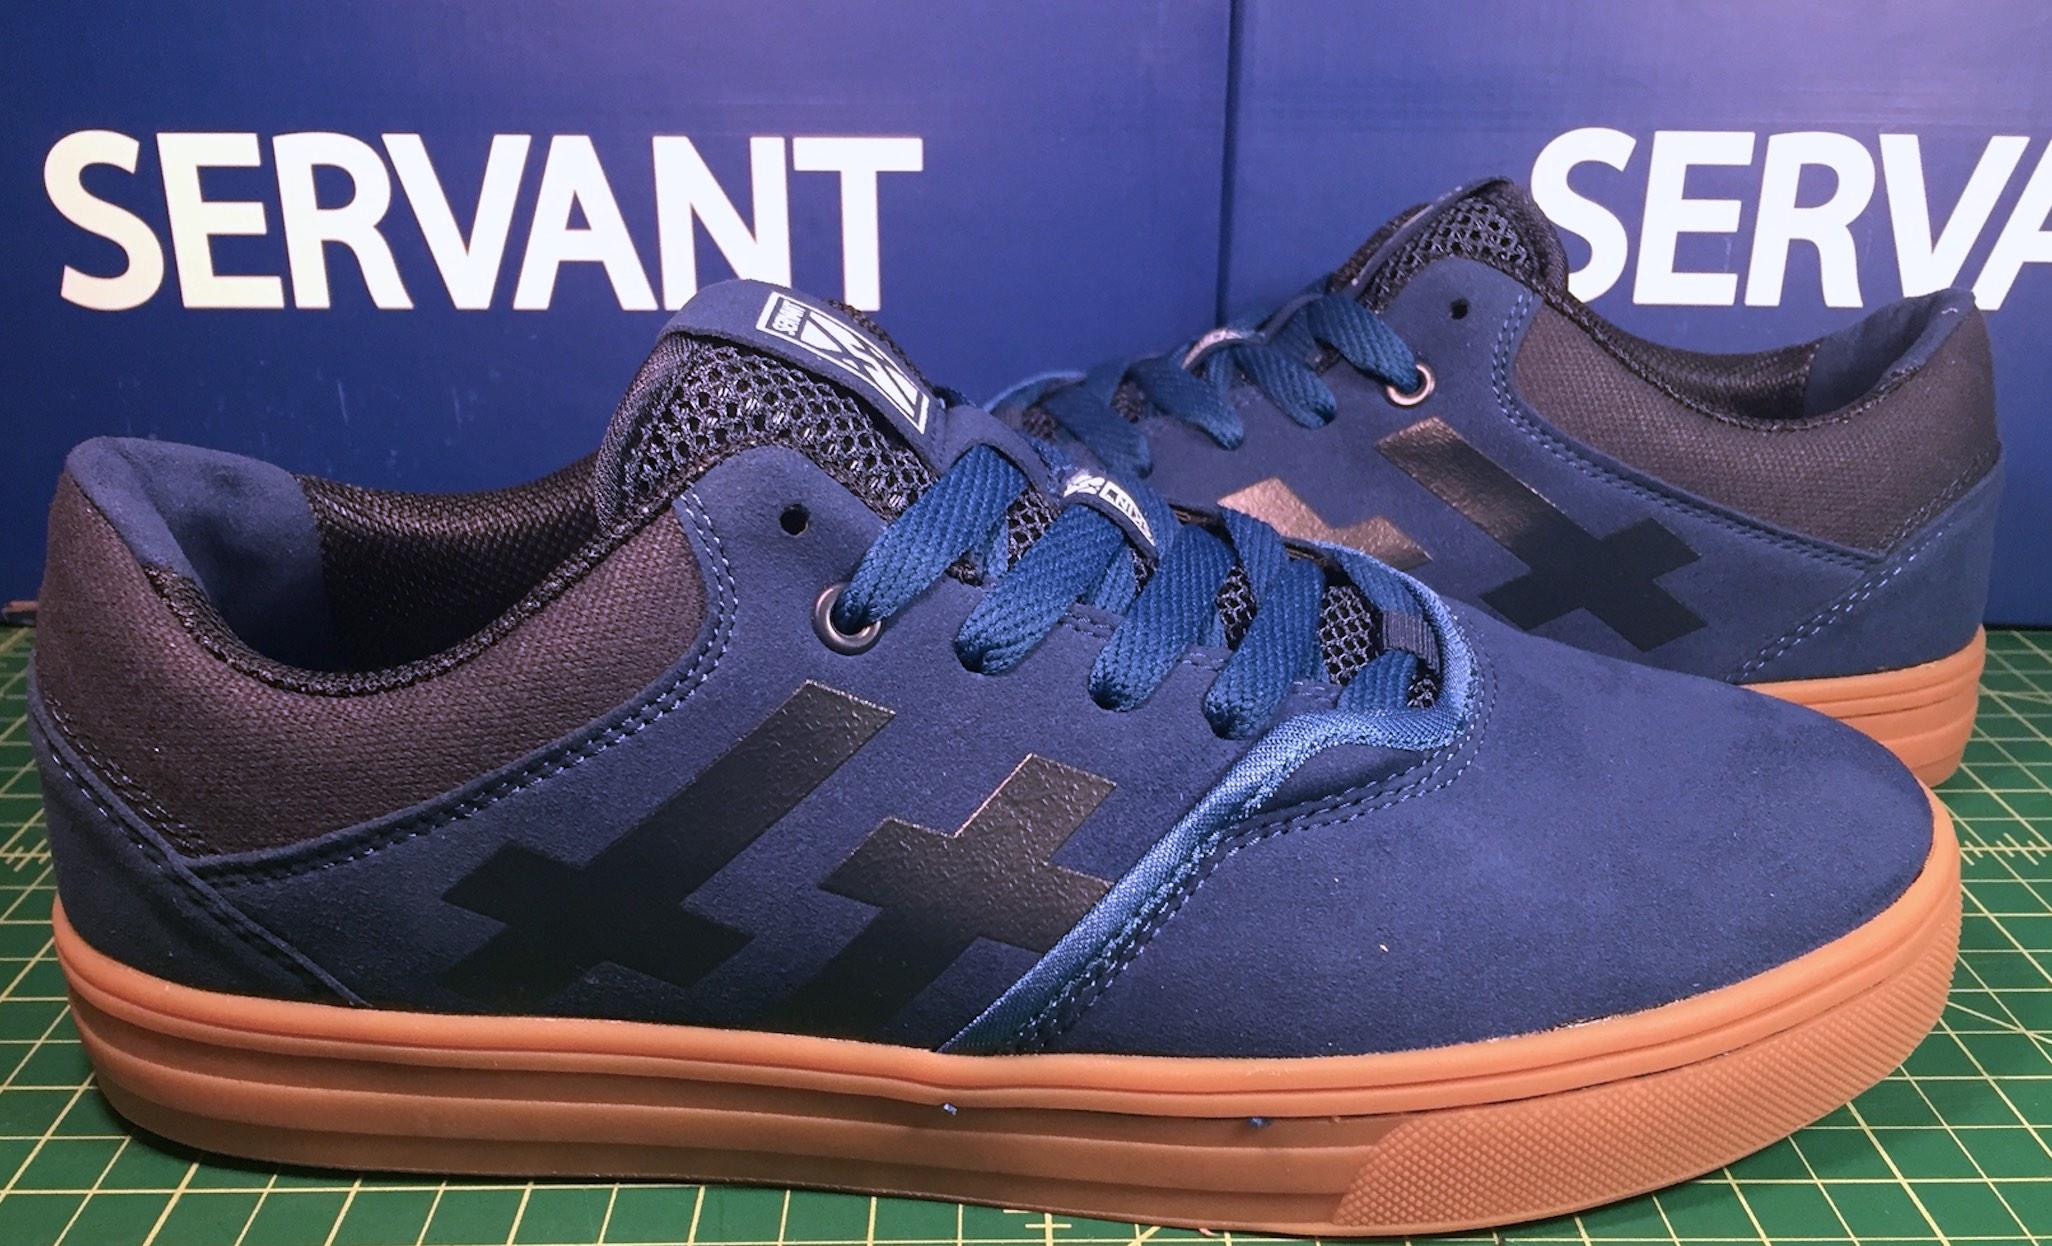 Servant Dagon vegan skateboard shoes faux suede